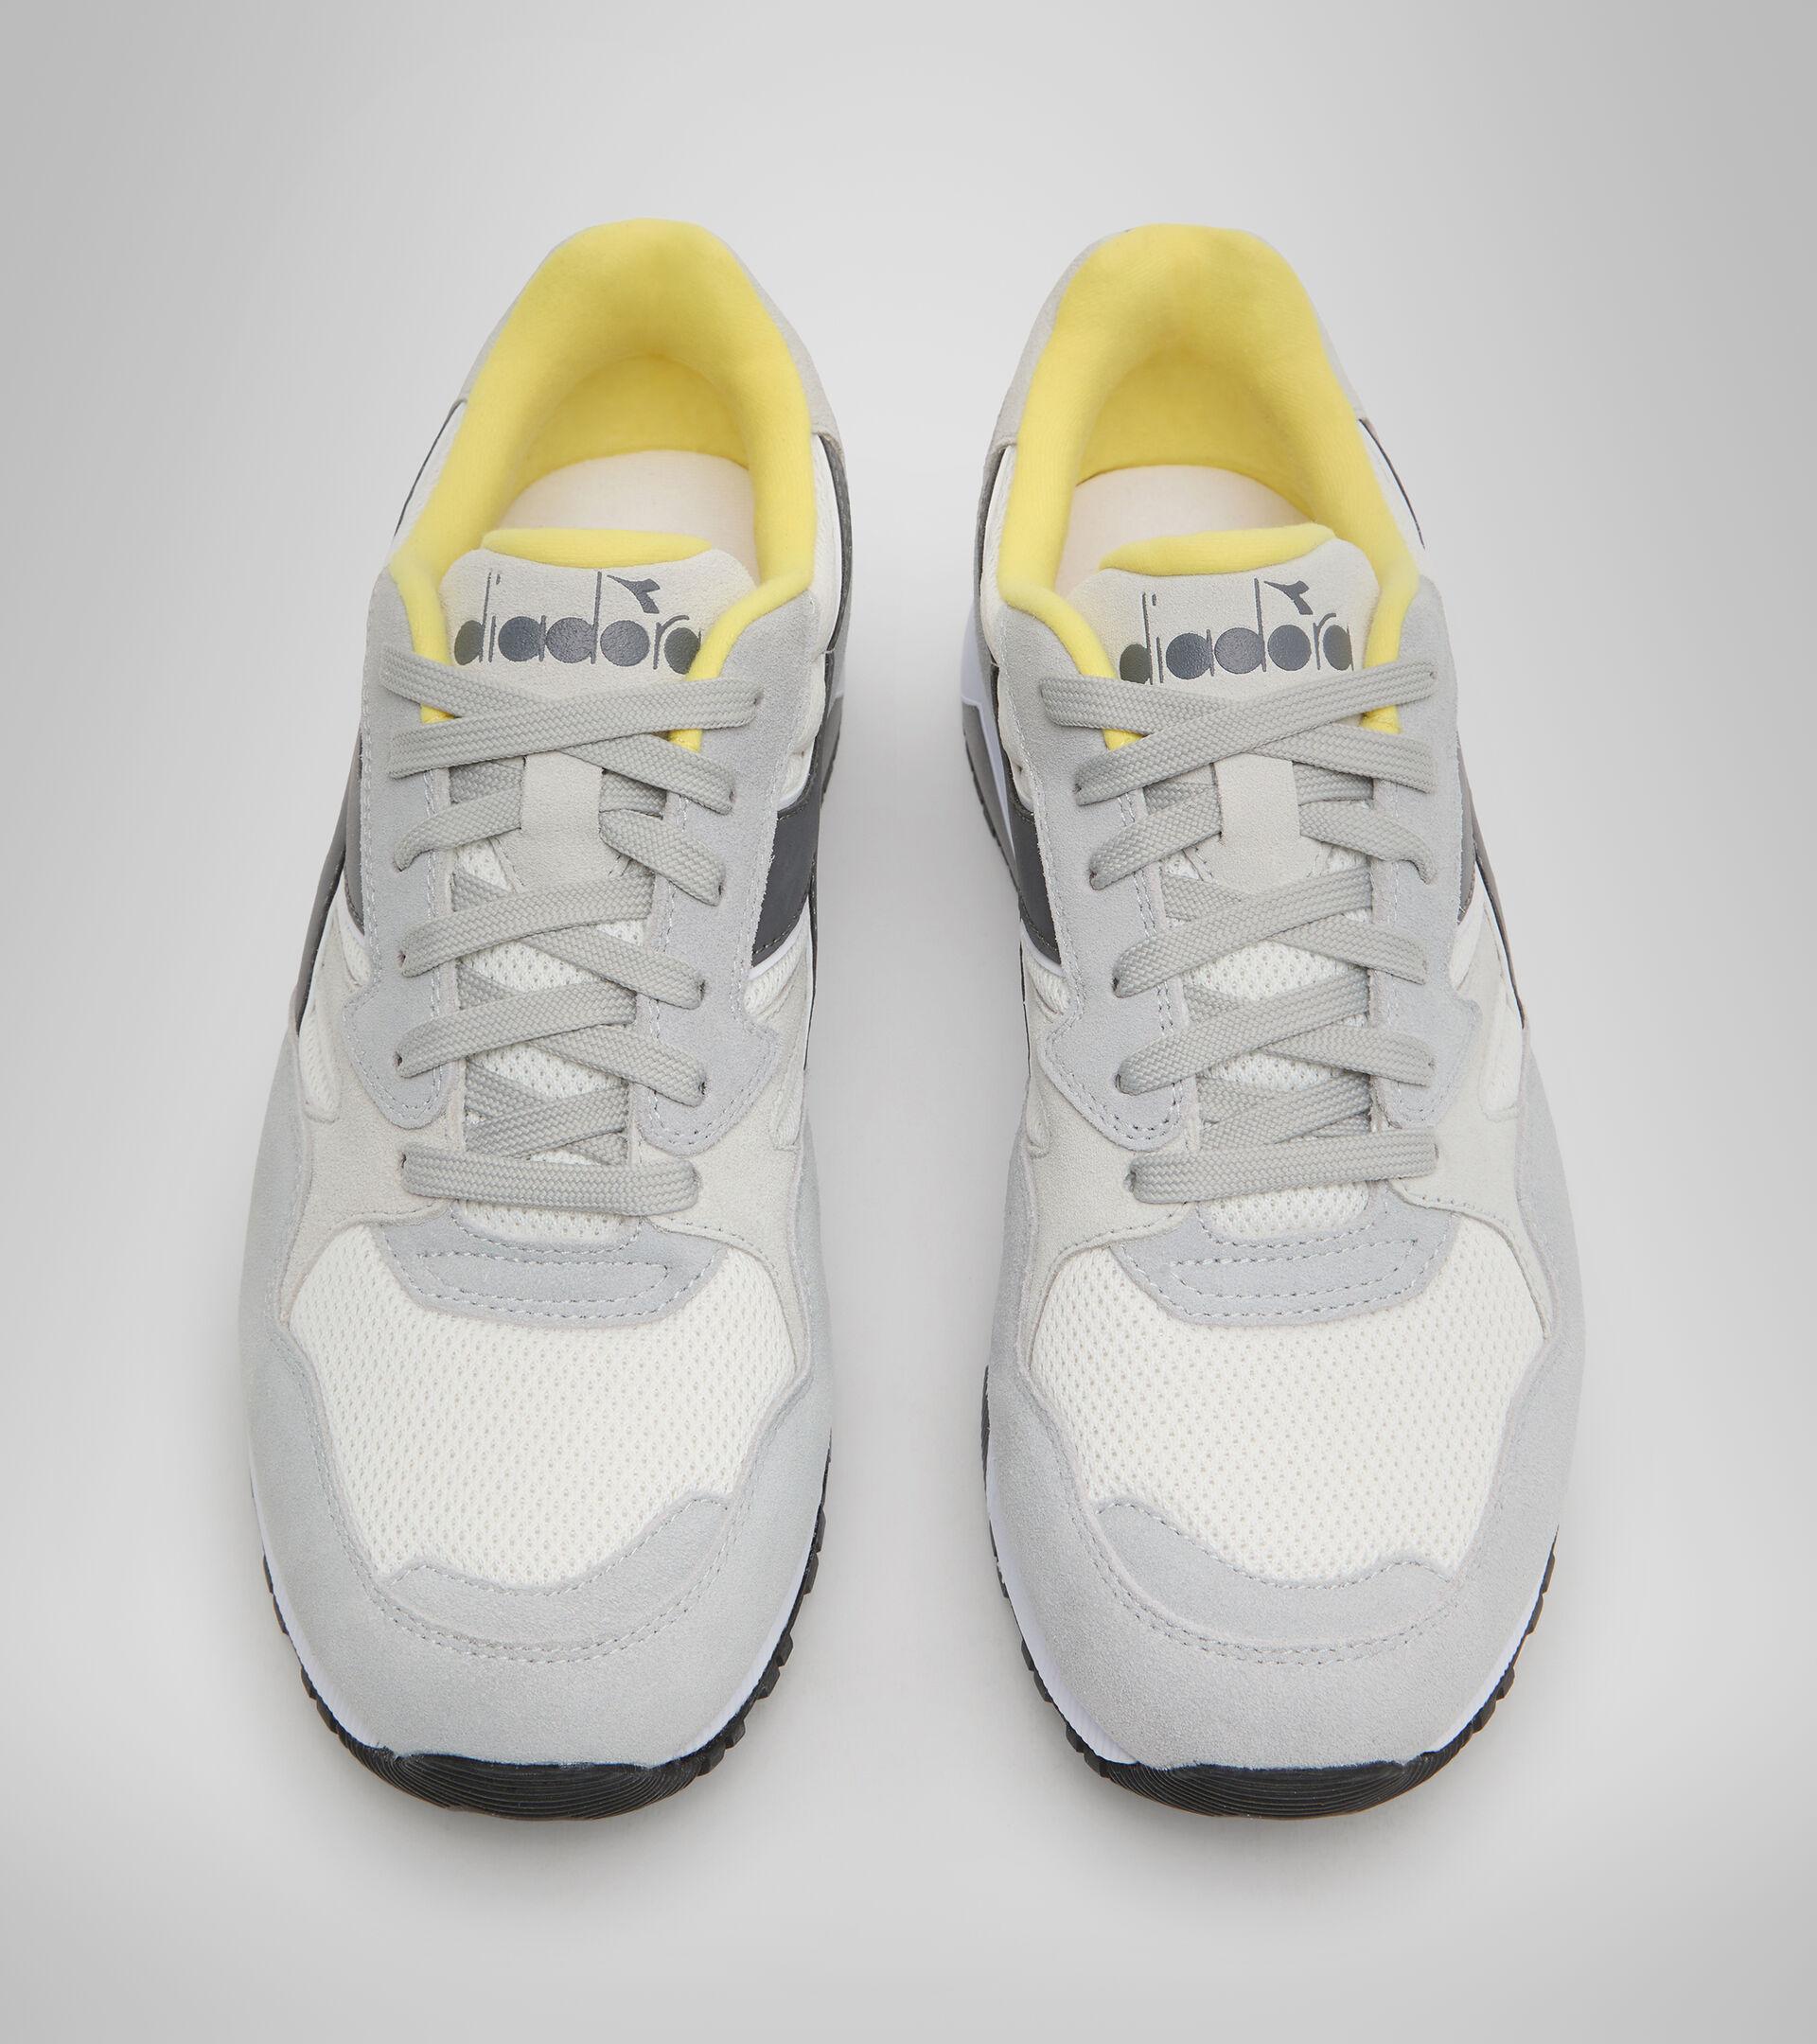 Footwear Sportswear UNISEX N902 S ALUMINIO/GRIS ACERO Diadora